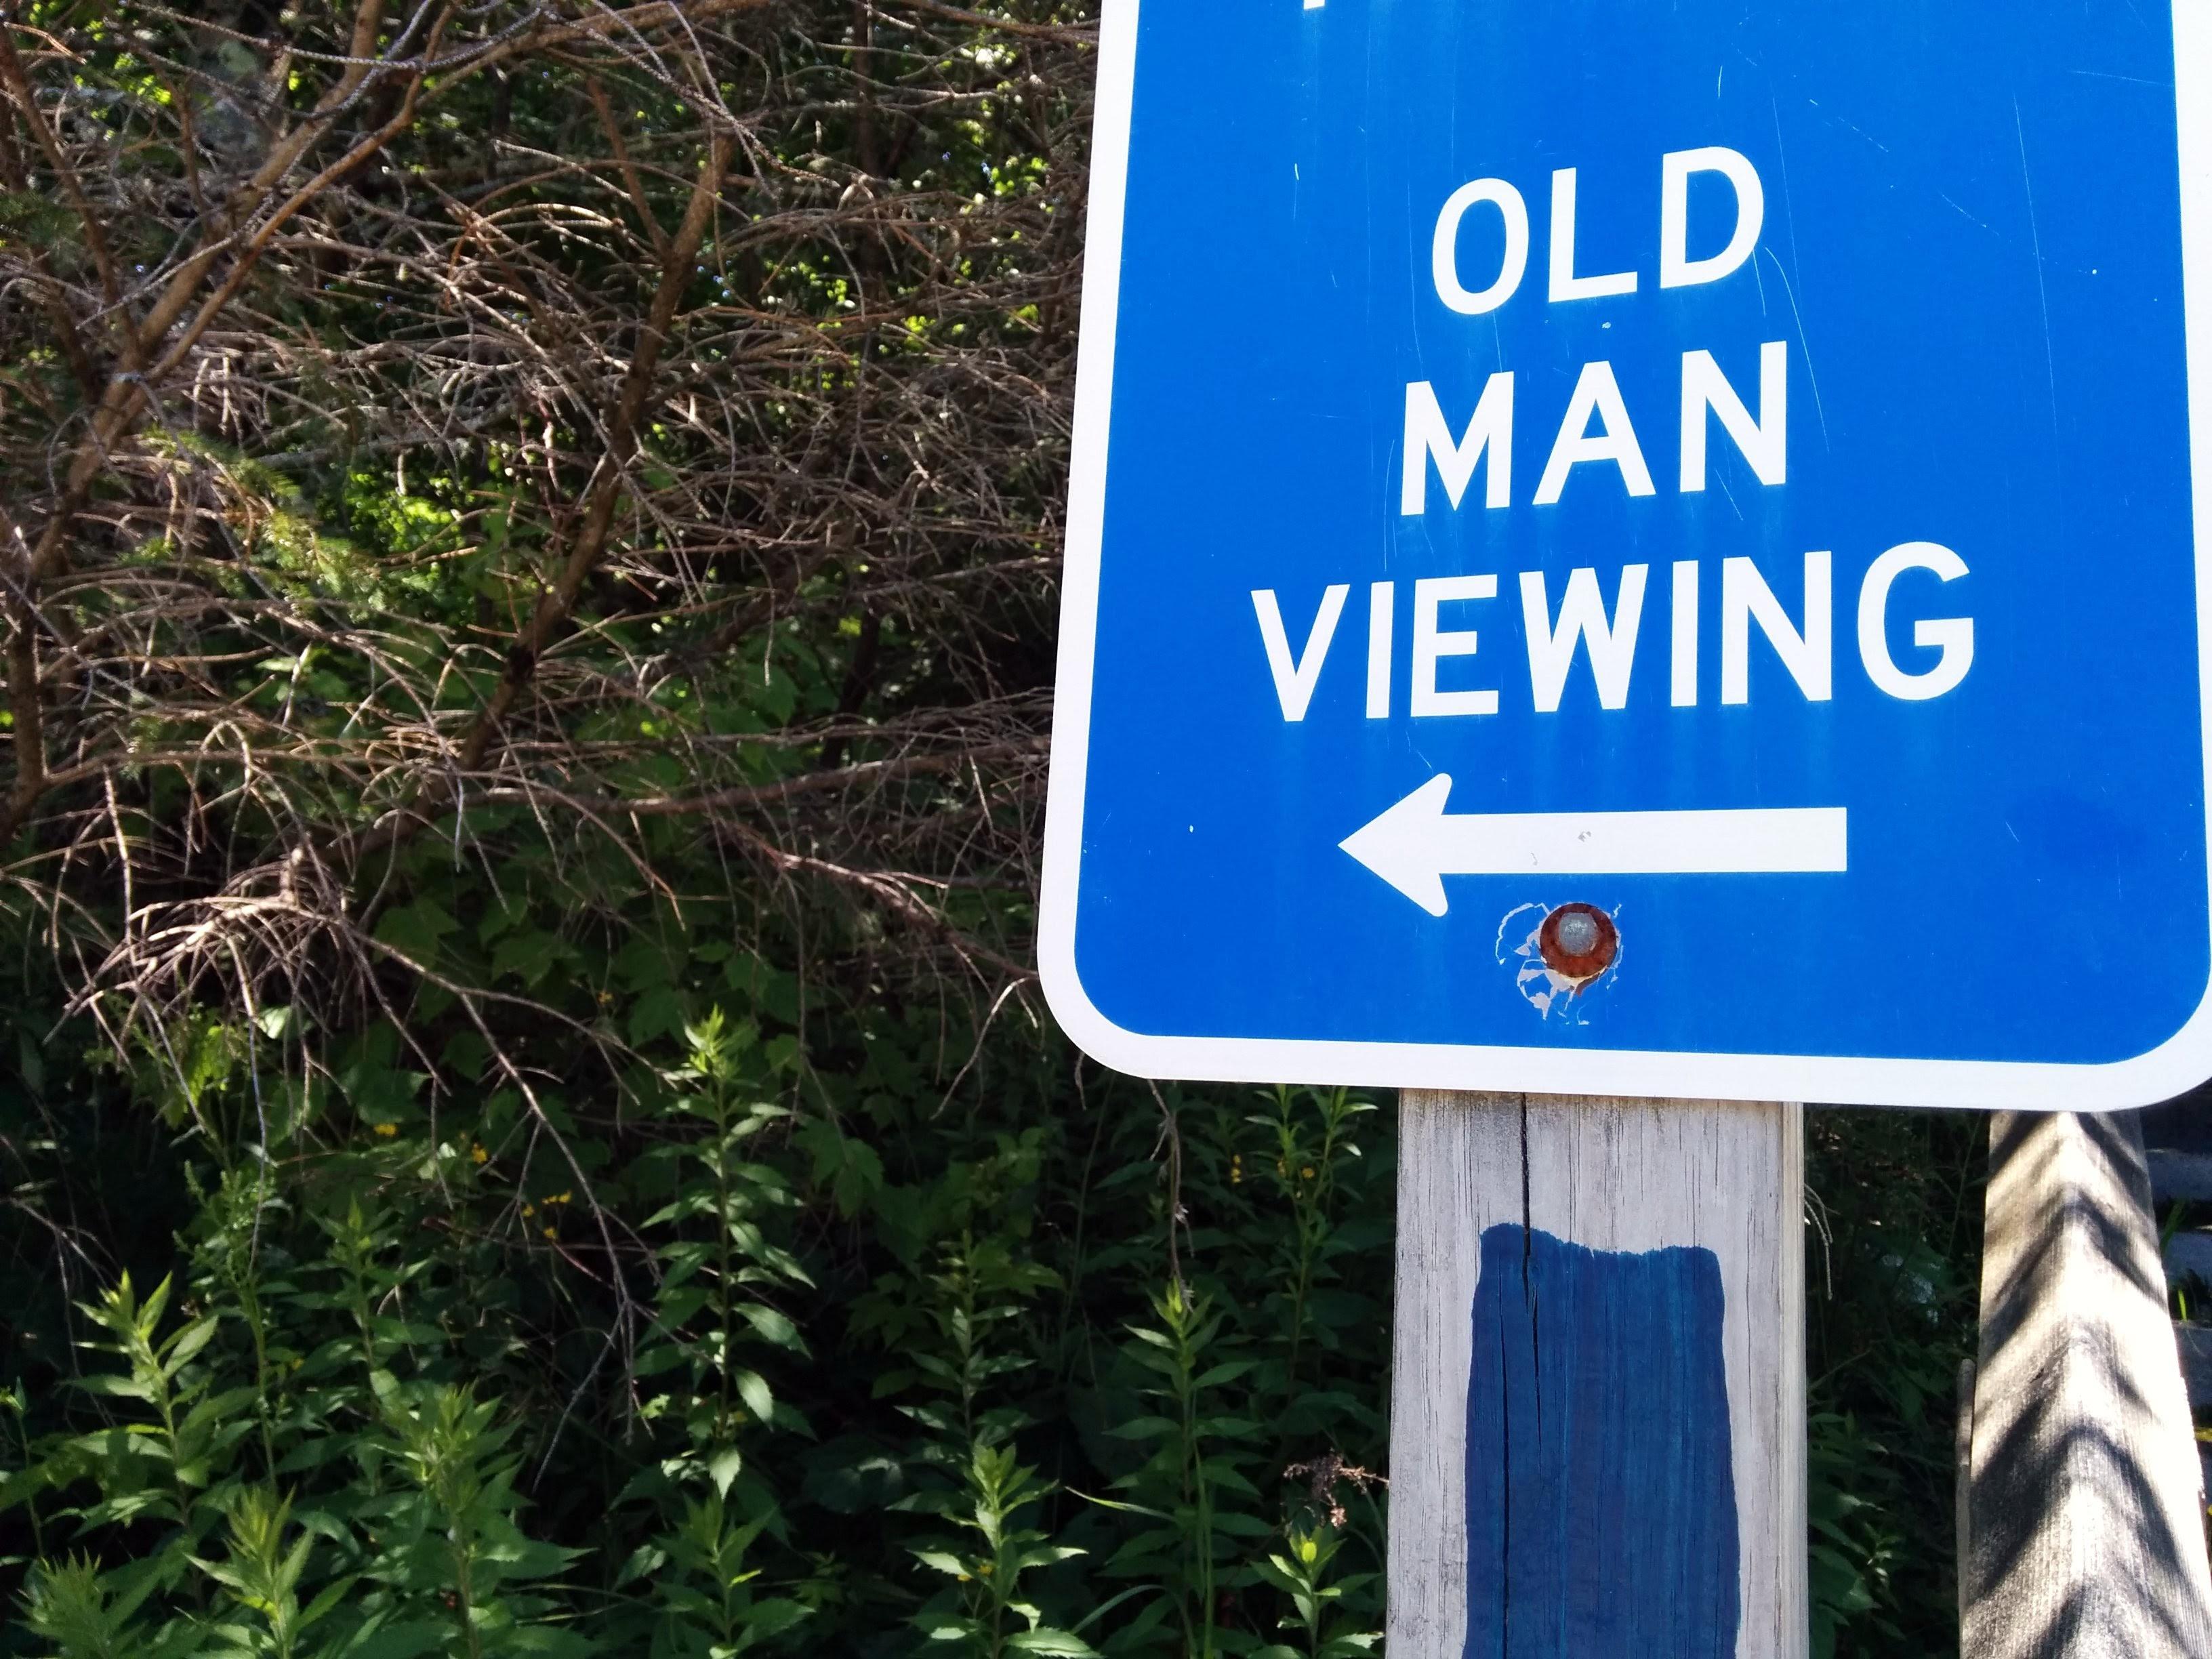 Photo: Wanna go see an old man?